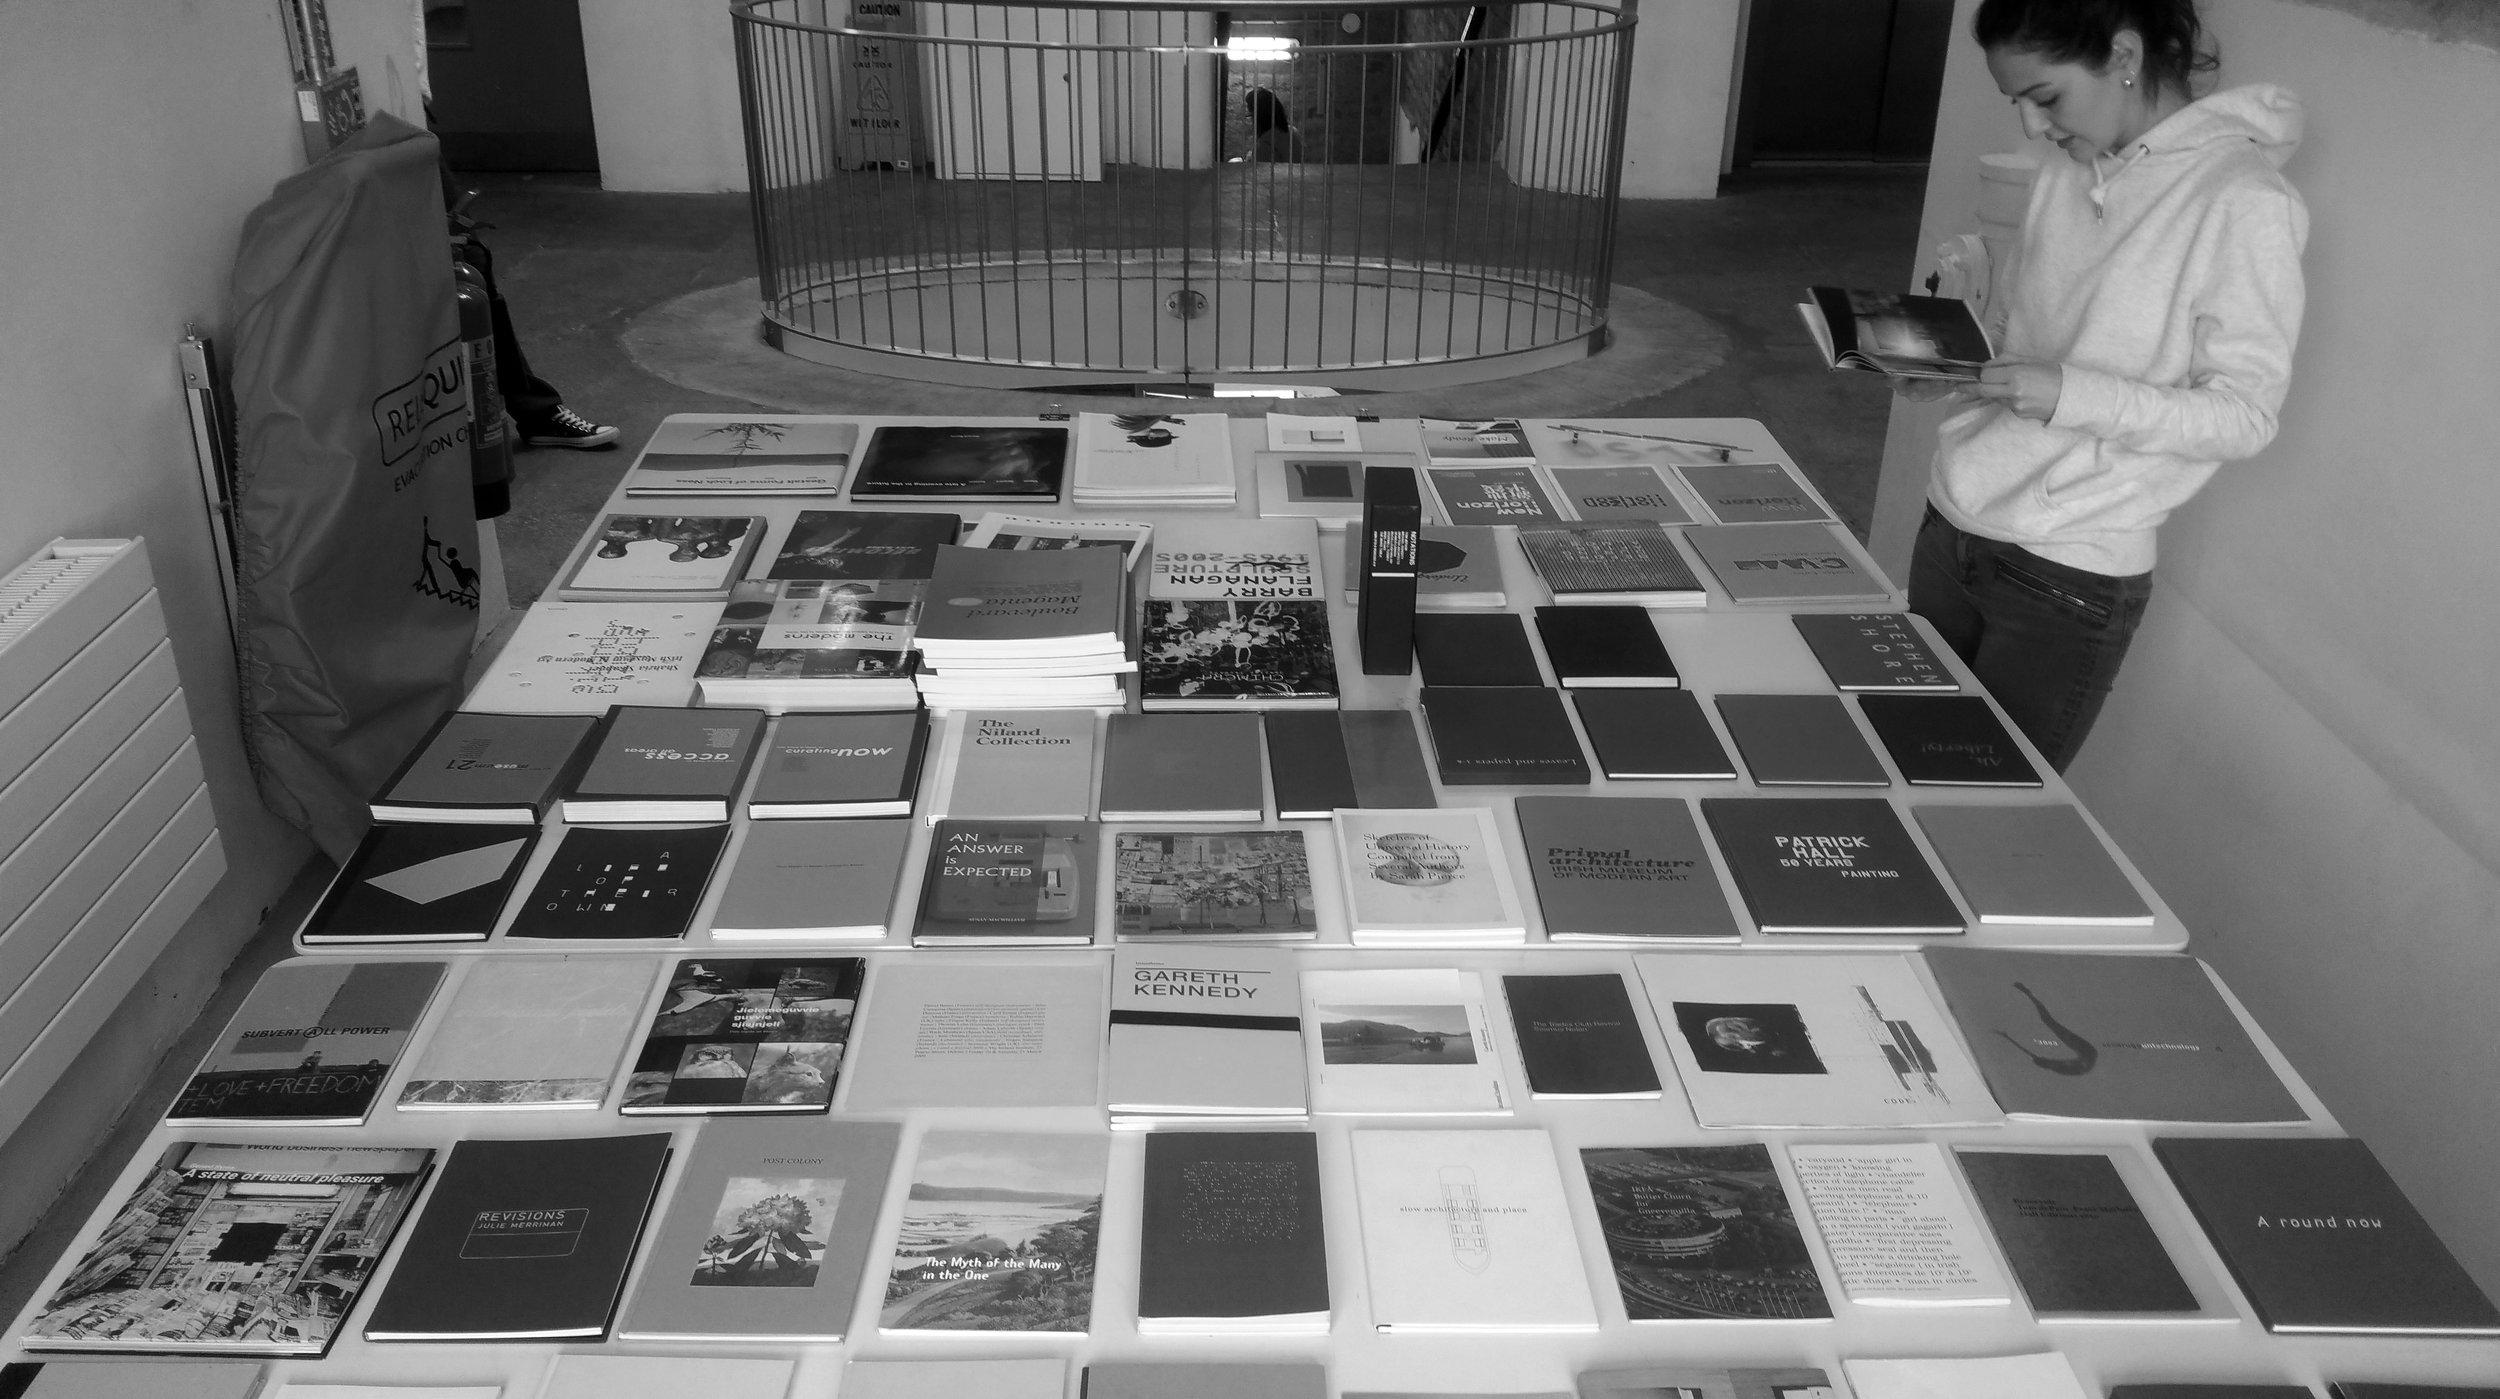 Nadia looks at 1 of 91 titles on display, 1 May 2018